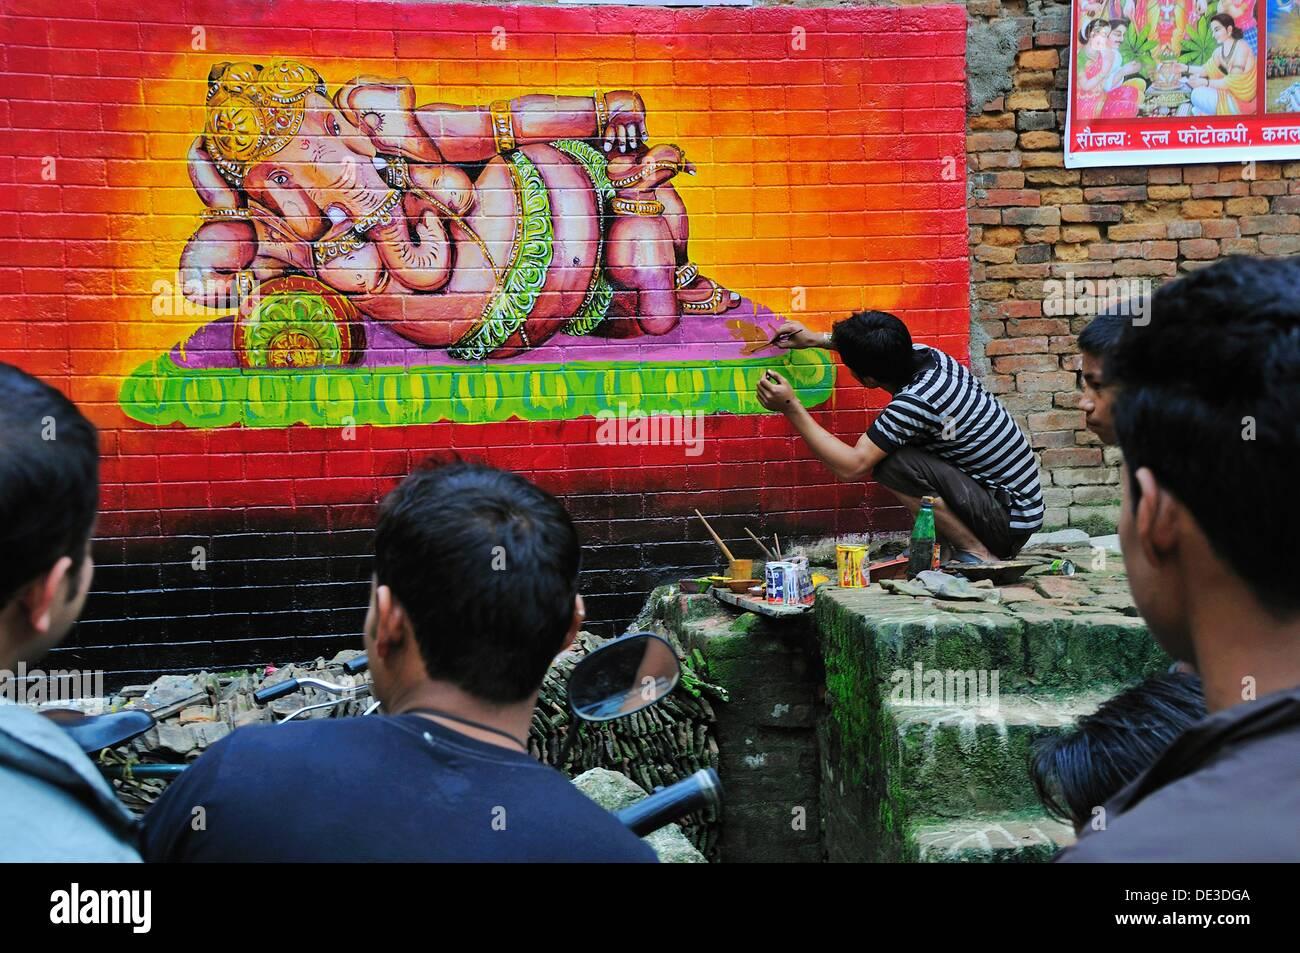 Man panting sleeping Ganesh on the wall on the street - Stock Image